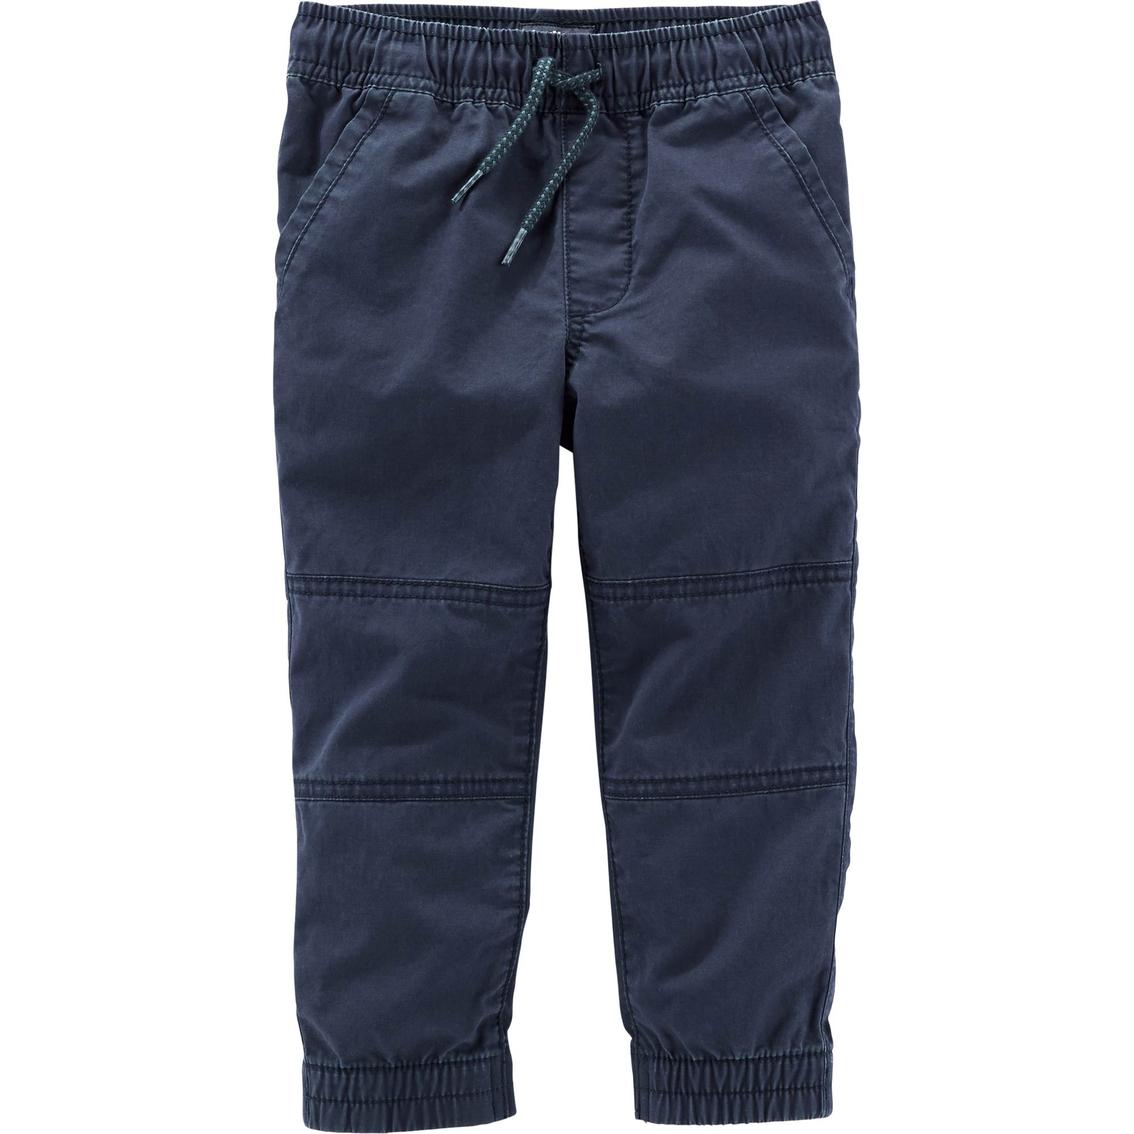 Oshkosh B\'gosh Little Boys Jogger Pants | Boys 4-7x | Apparel | Shop ...